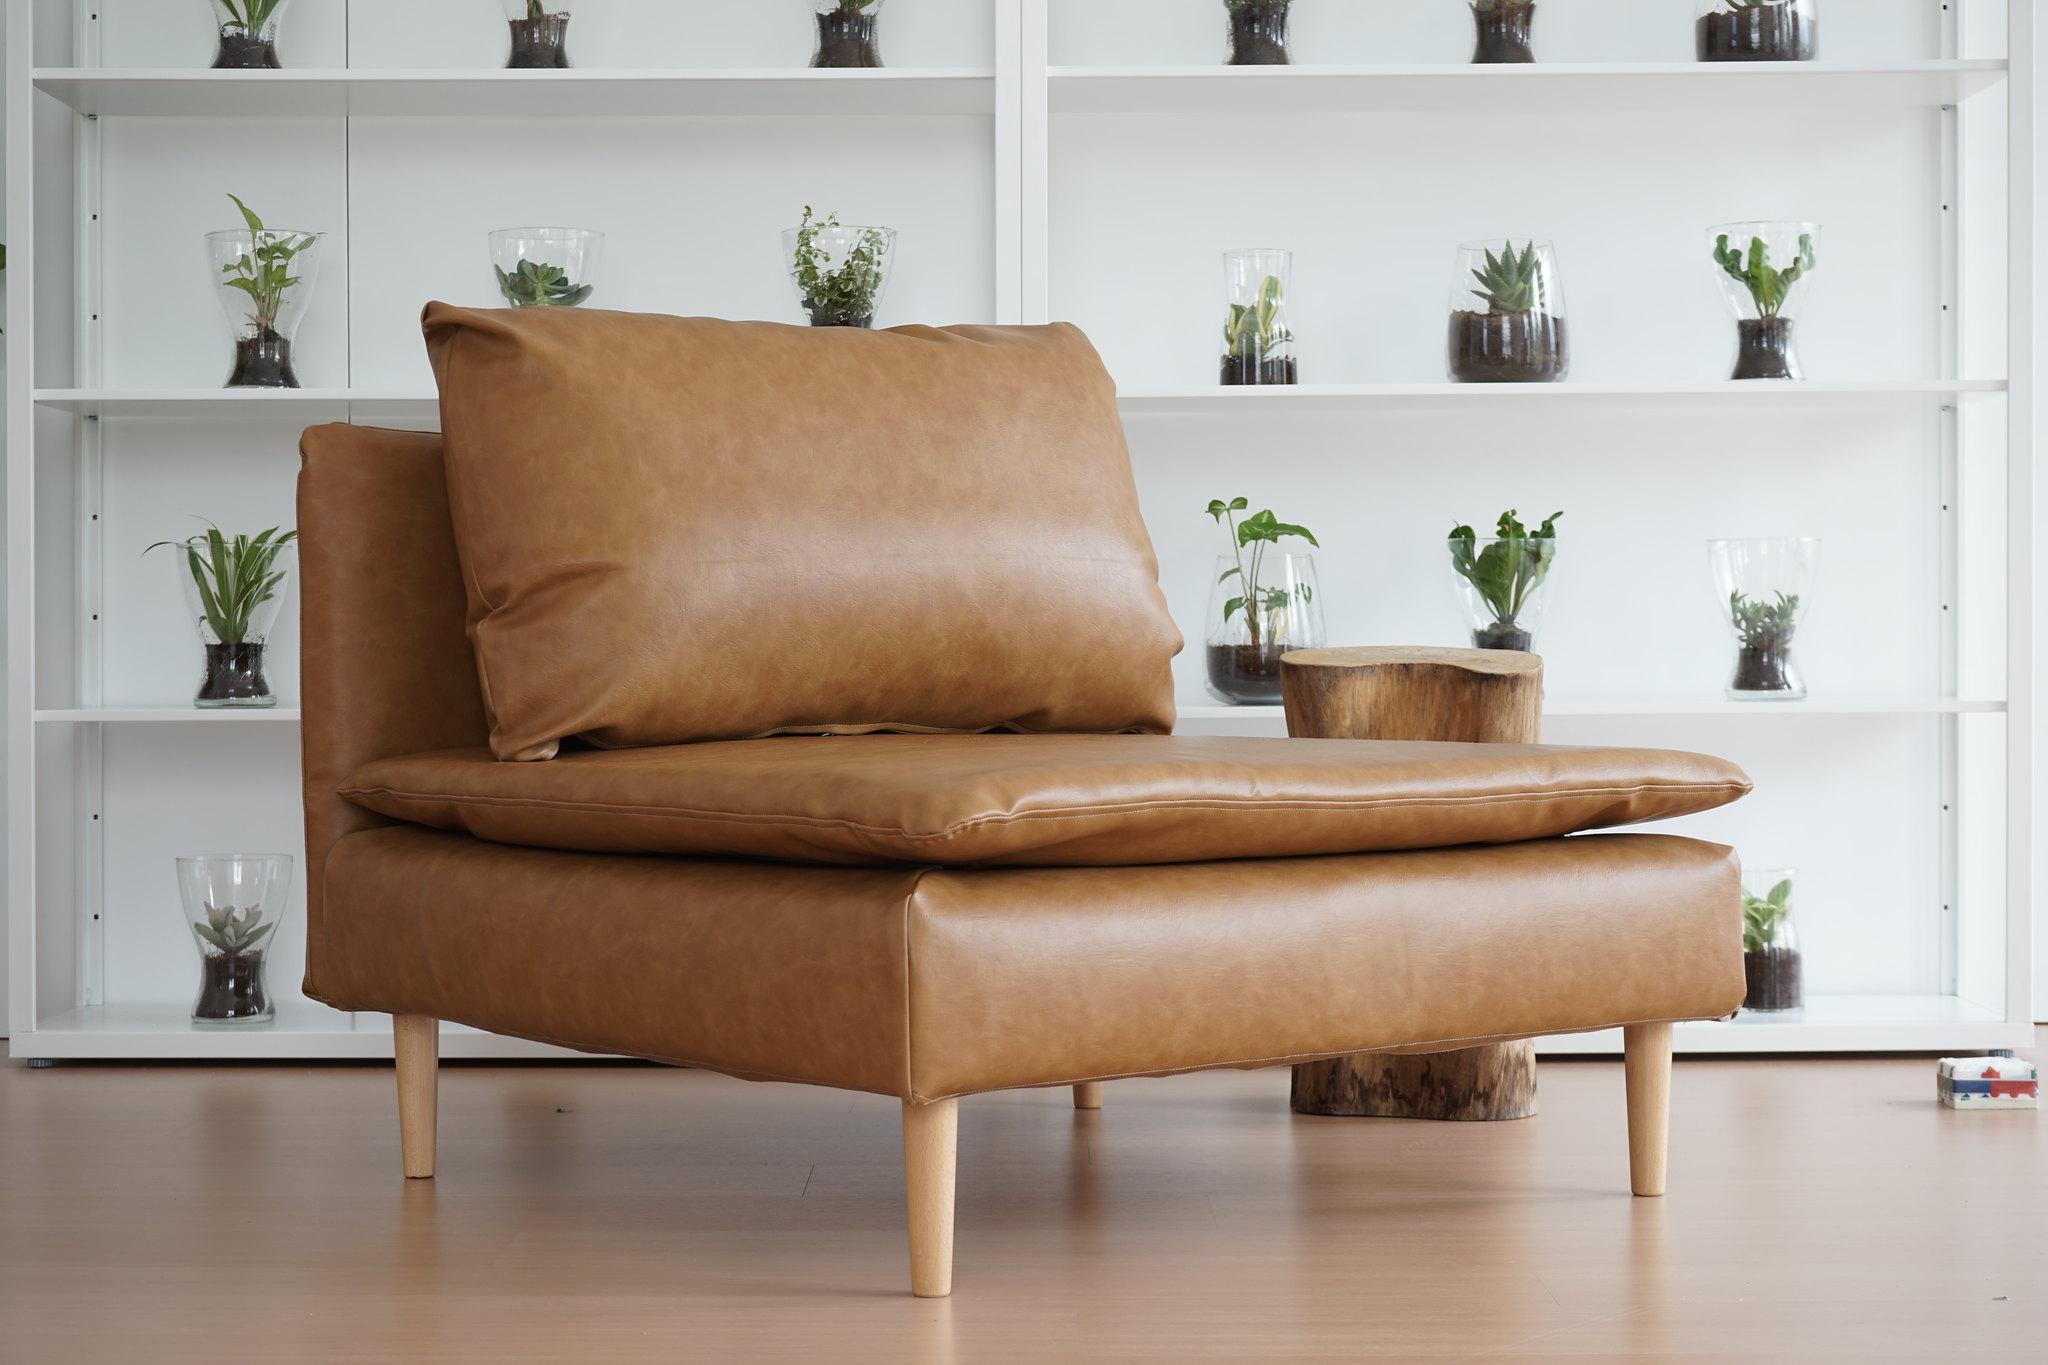 IKEA Soderhamn module slipcovered in leather sofa covers